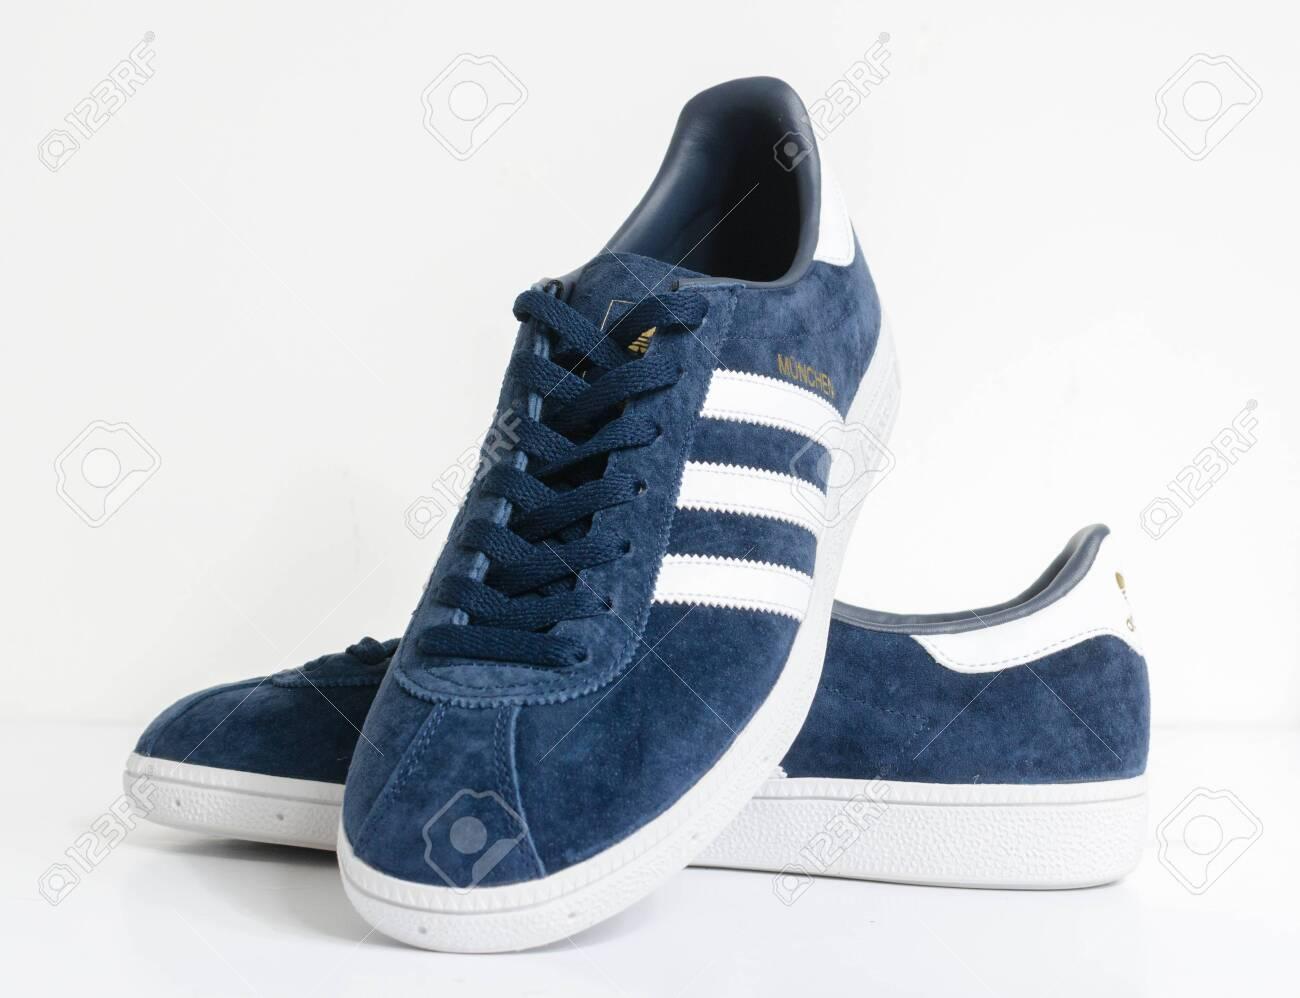 london, england, 05/05/2018 Adidas Munchen gazelle vintage sneaker..